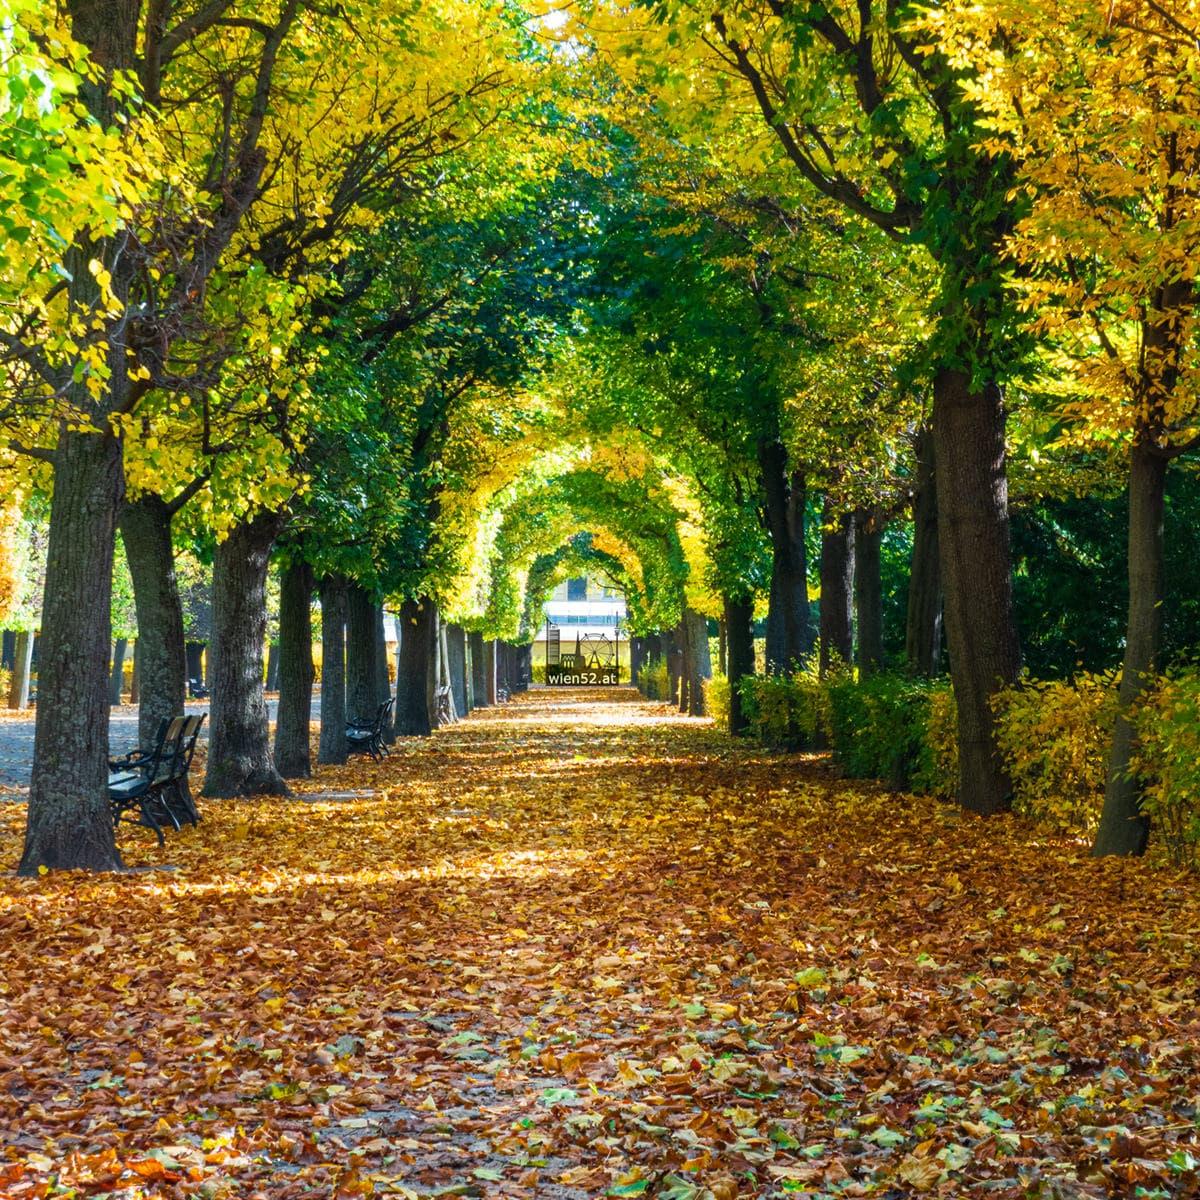 Herbst im Schlosspark Schönbrunn